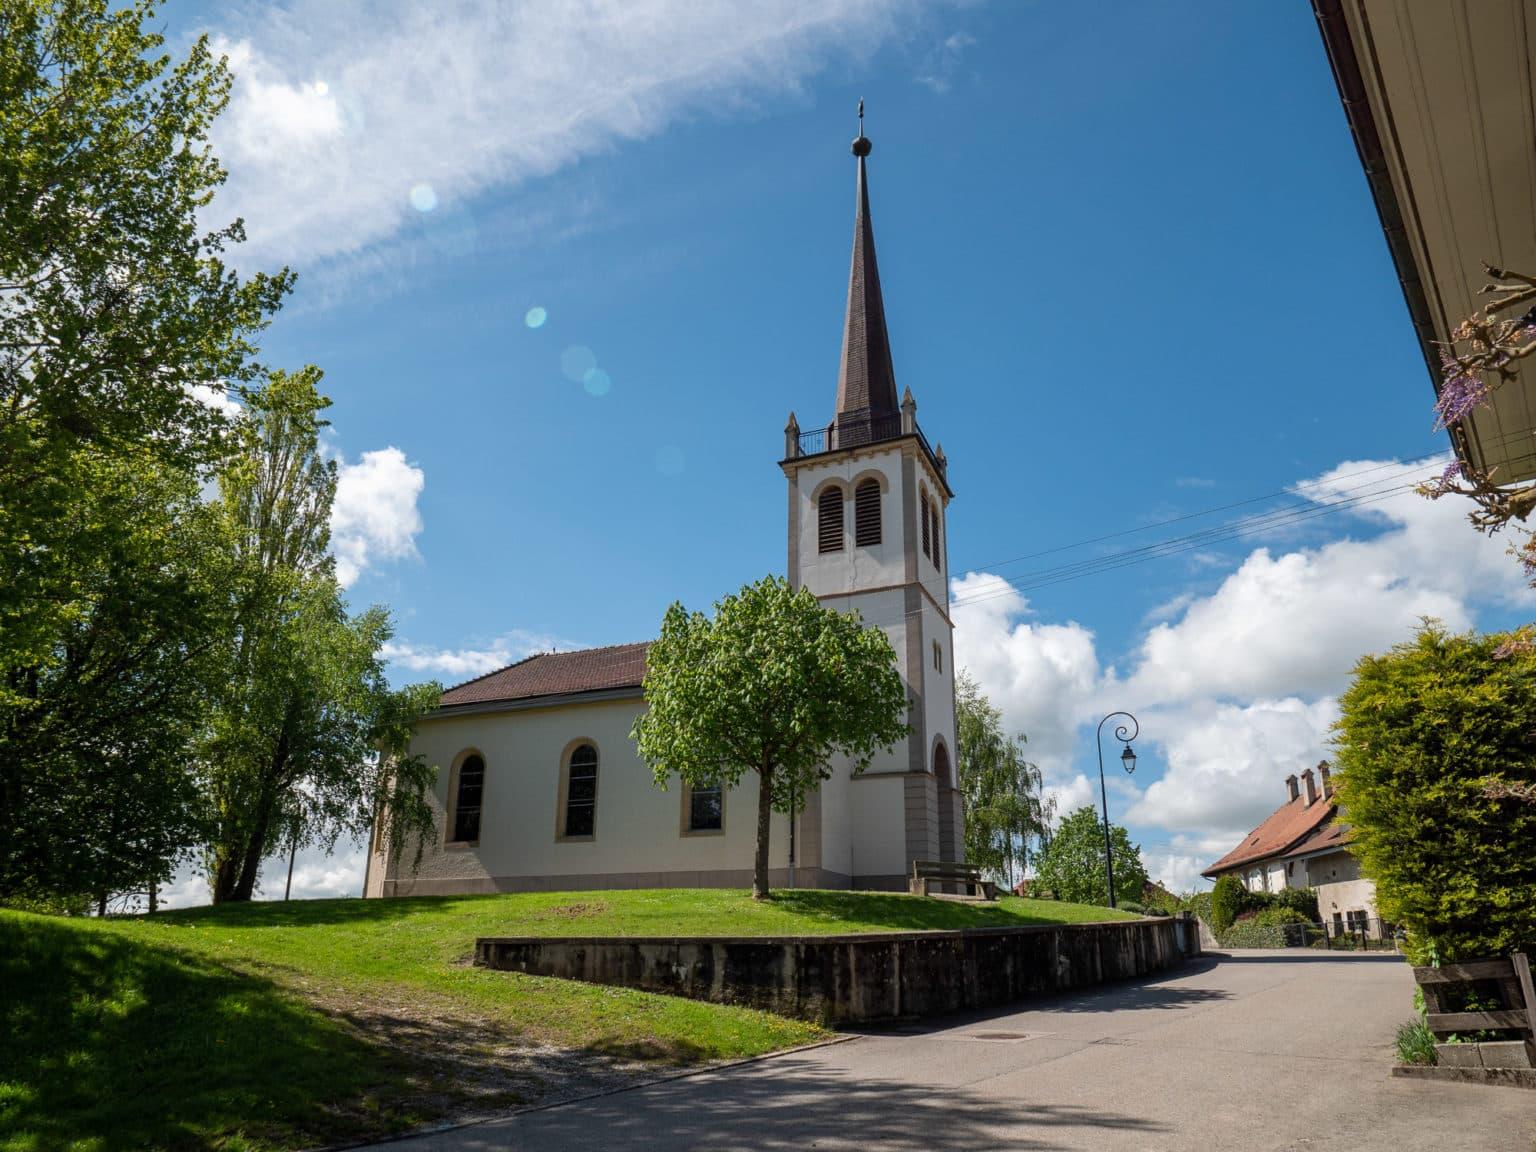 Refuges-salles-Montanaire©V-Dubach-52592